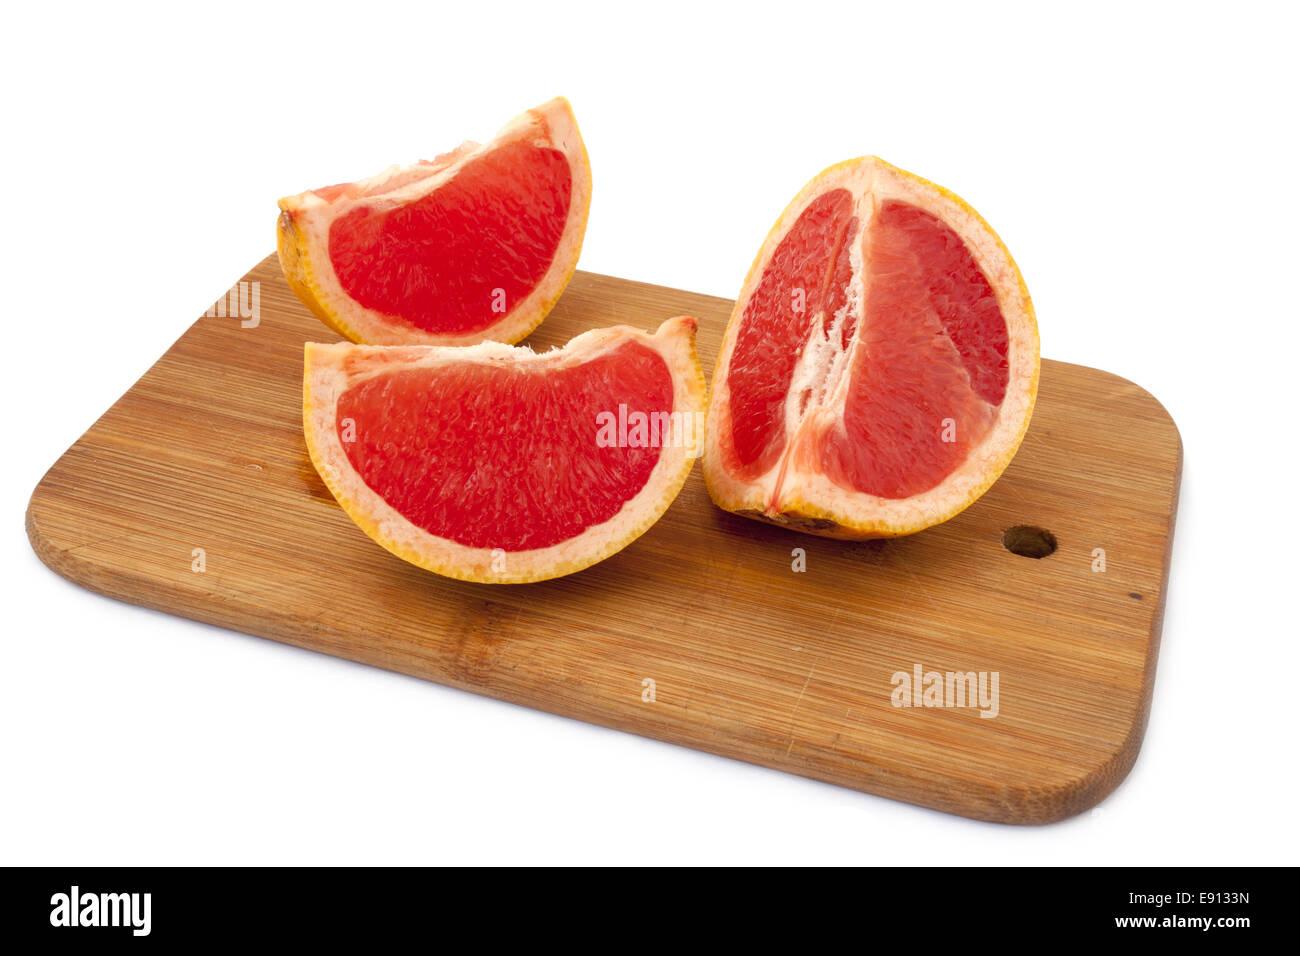 Grapefruit slices - Stock Image